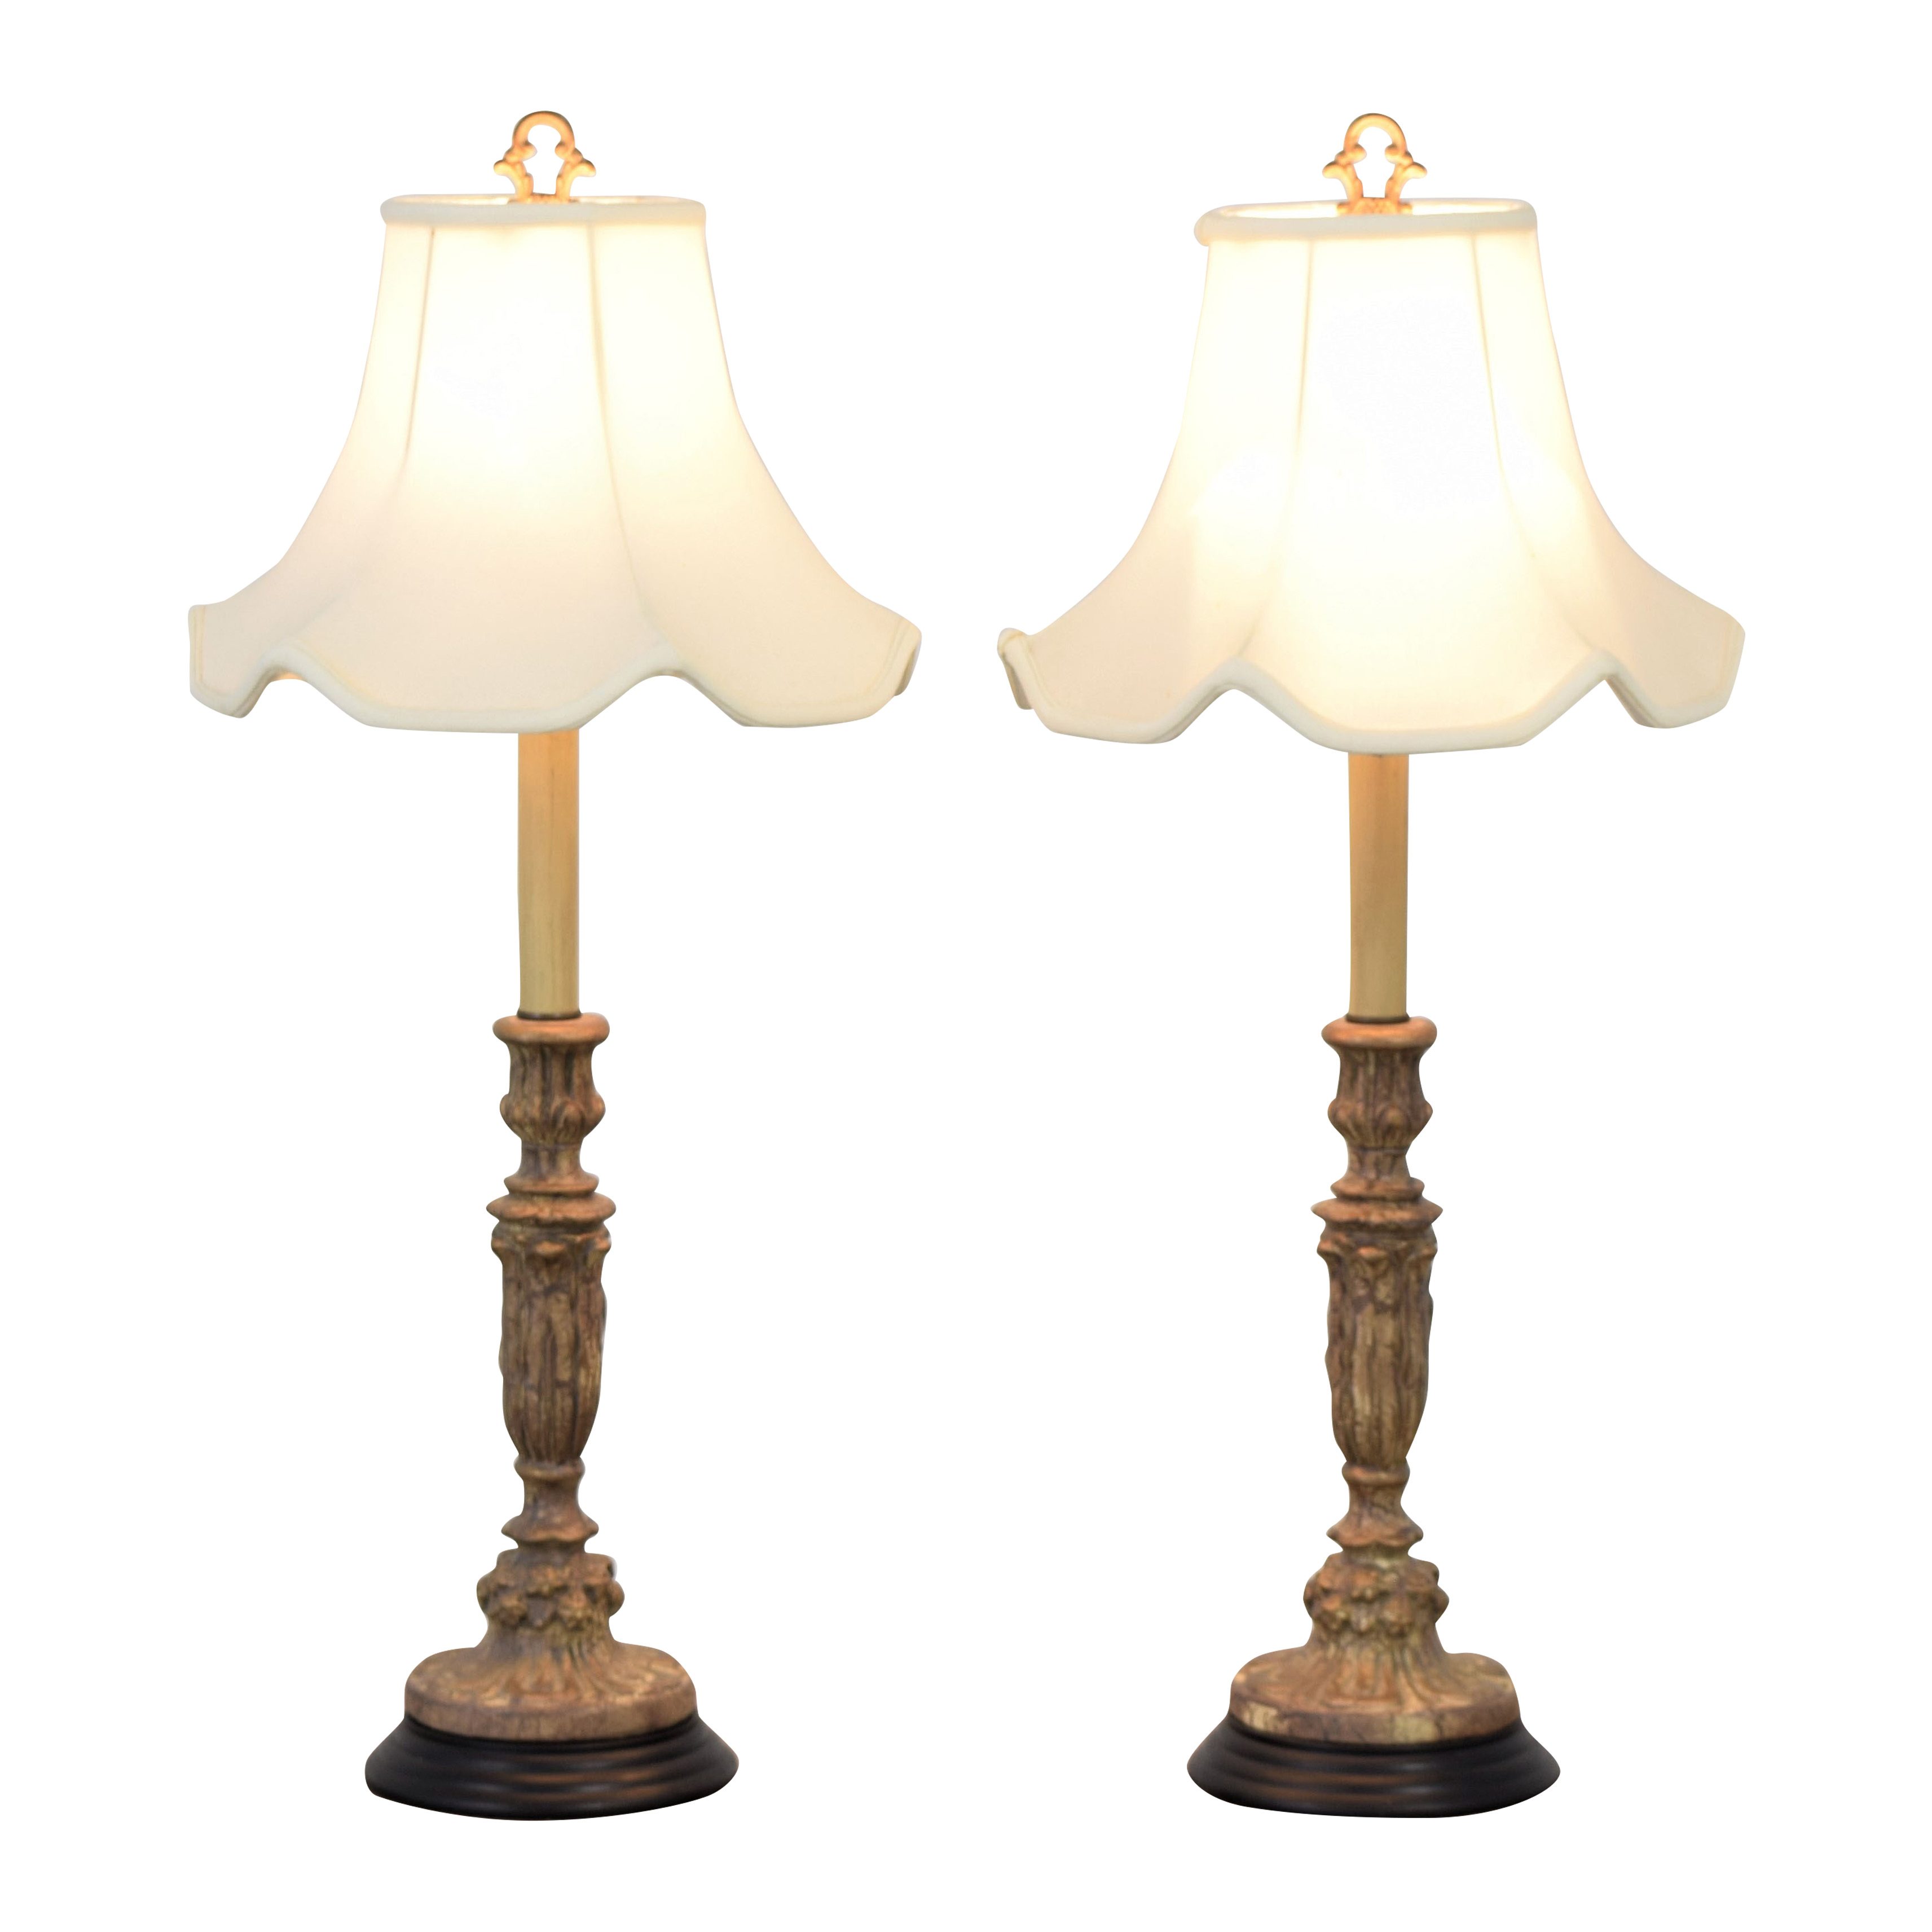 buy Italian Giltwood Candlestick Table Lamps  Decor